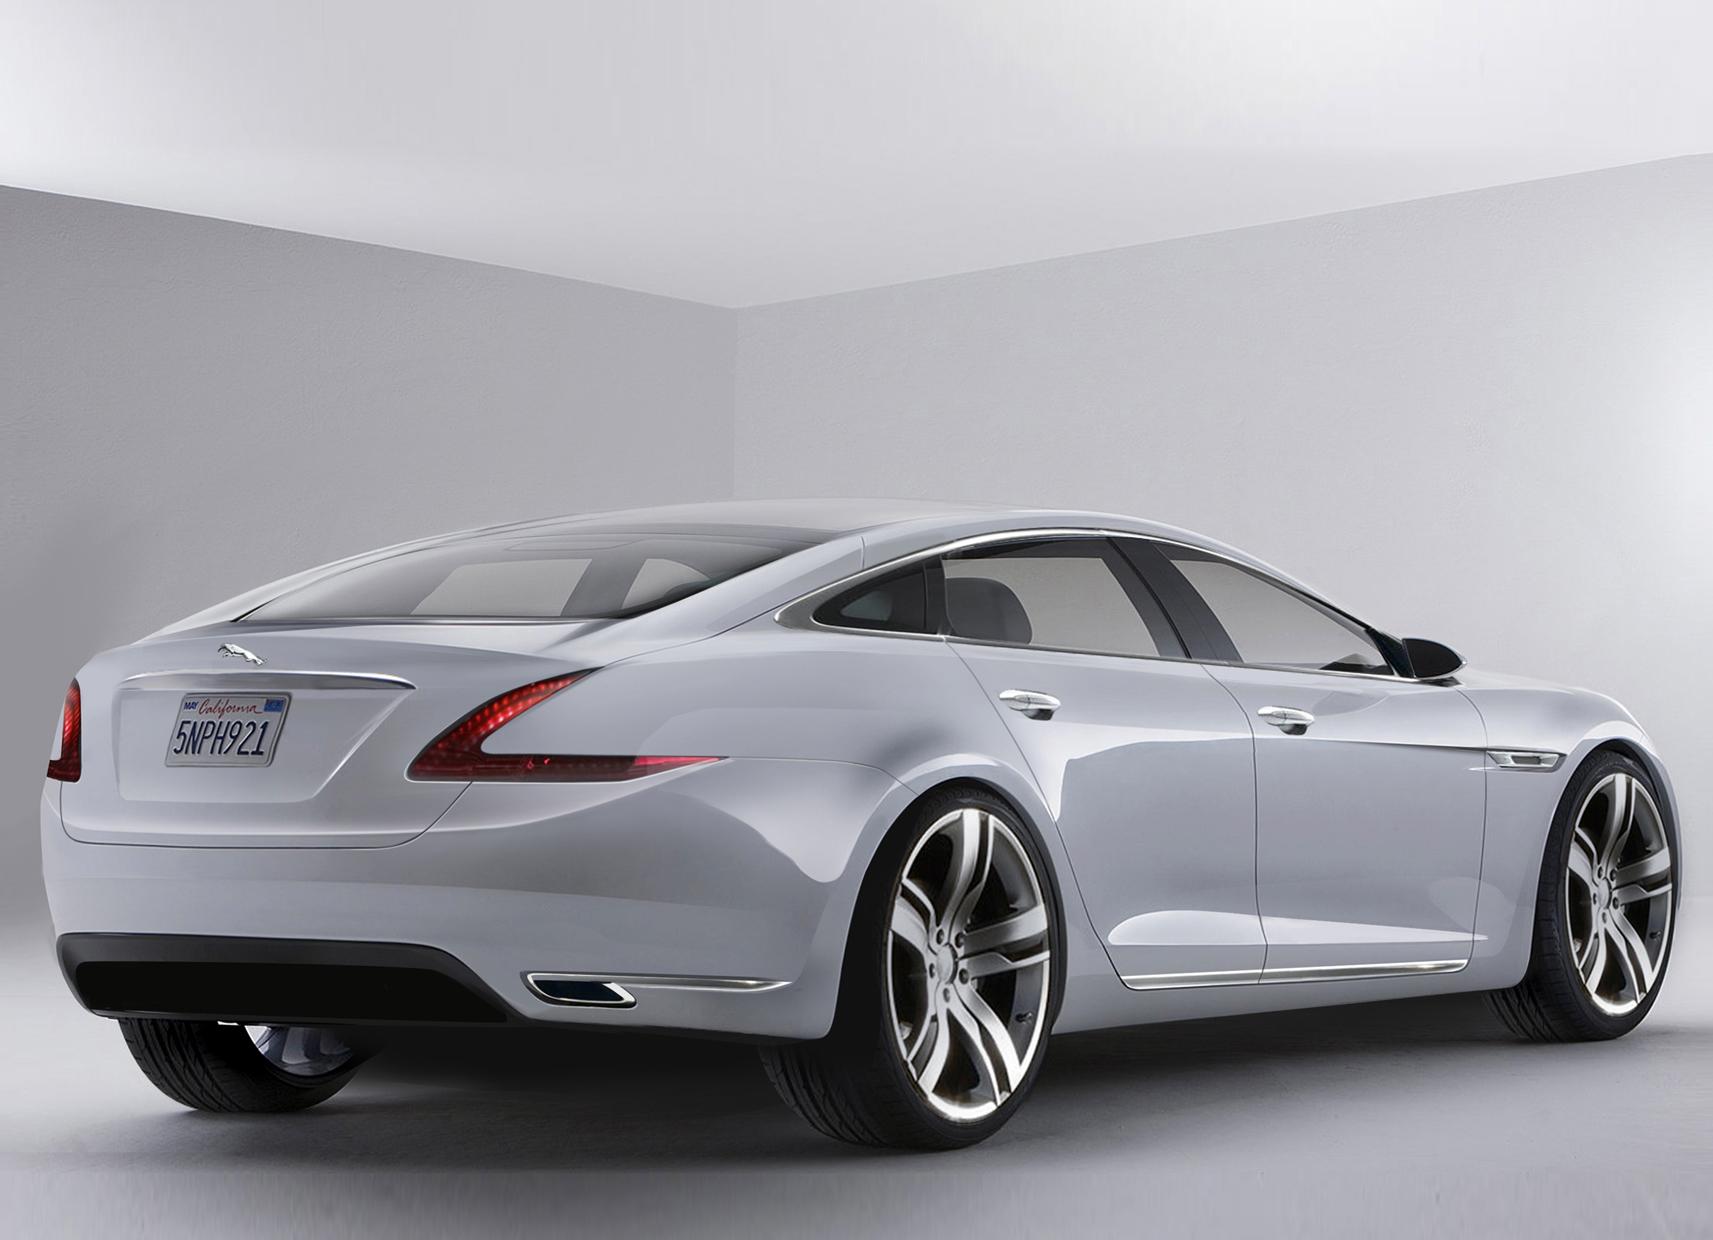 Jaguar Xs By Matthew Swann At Coroflot Com